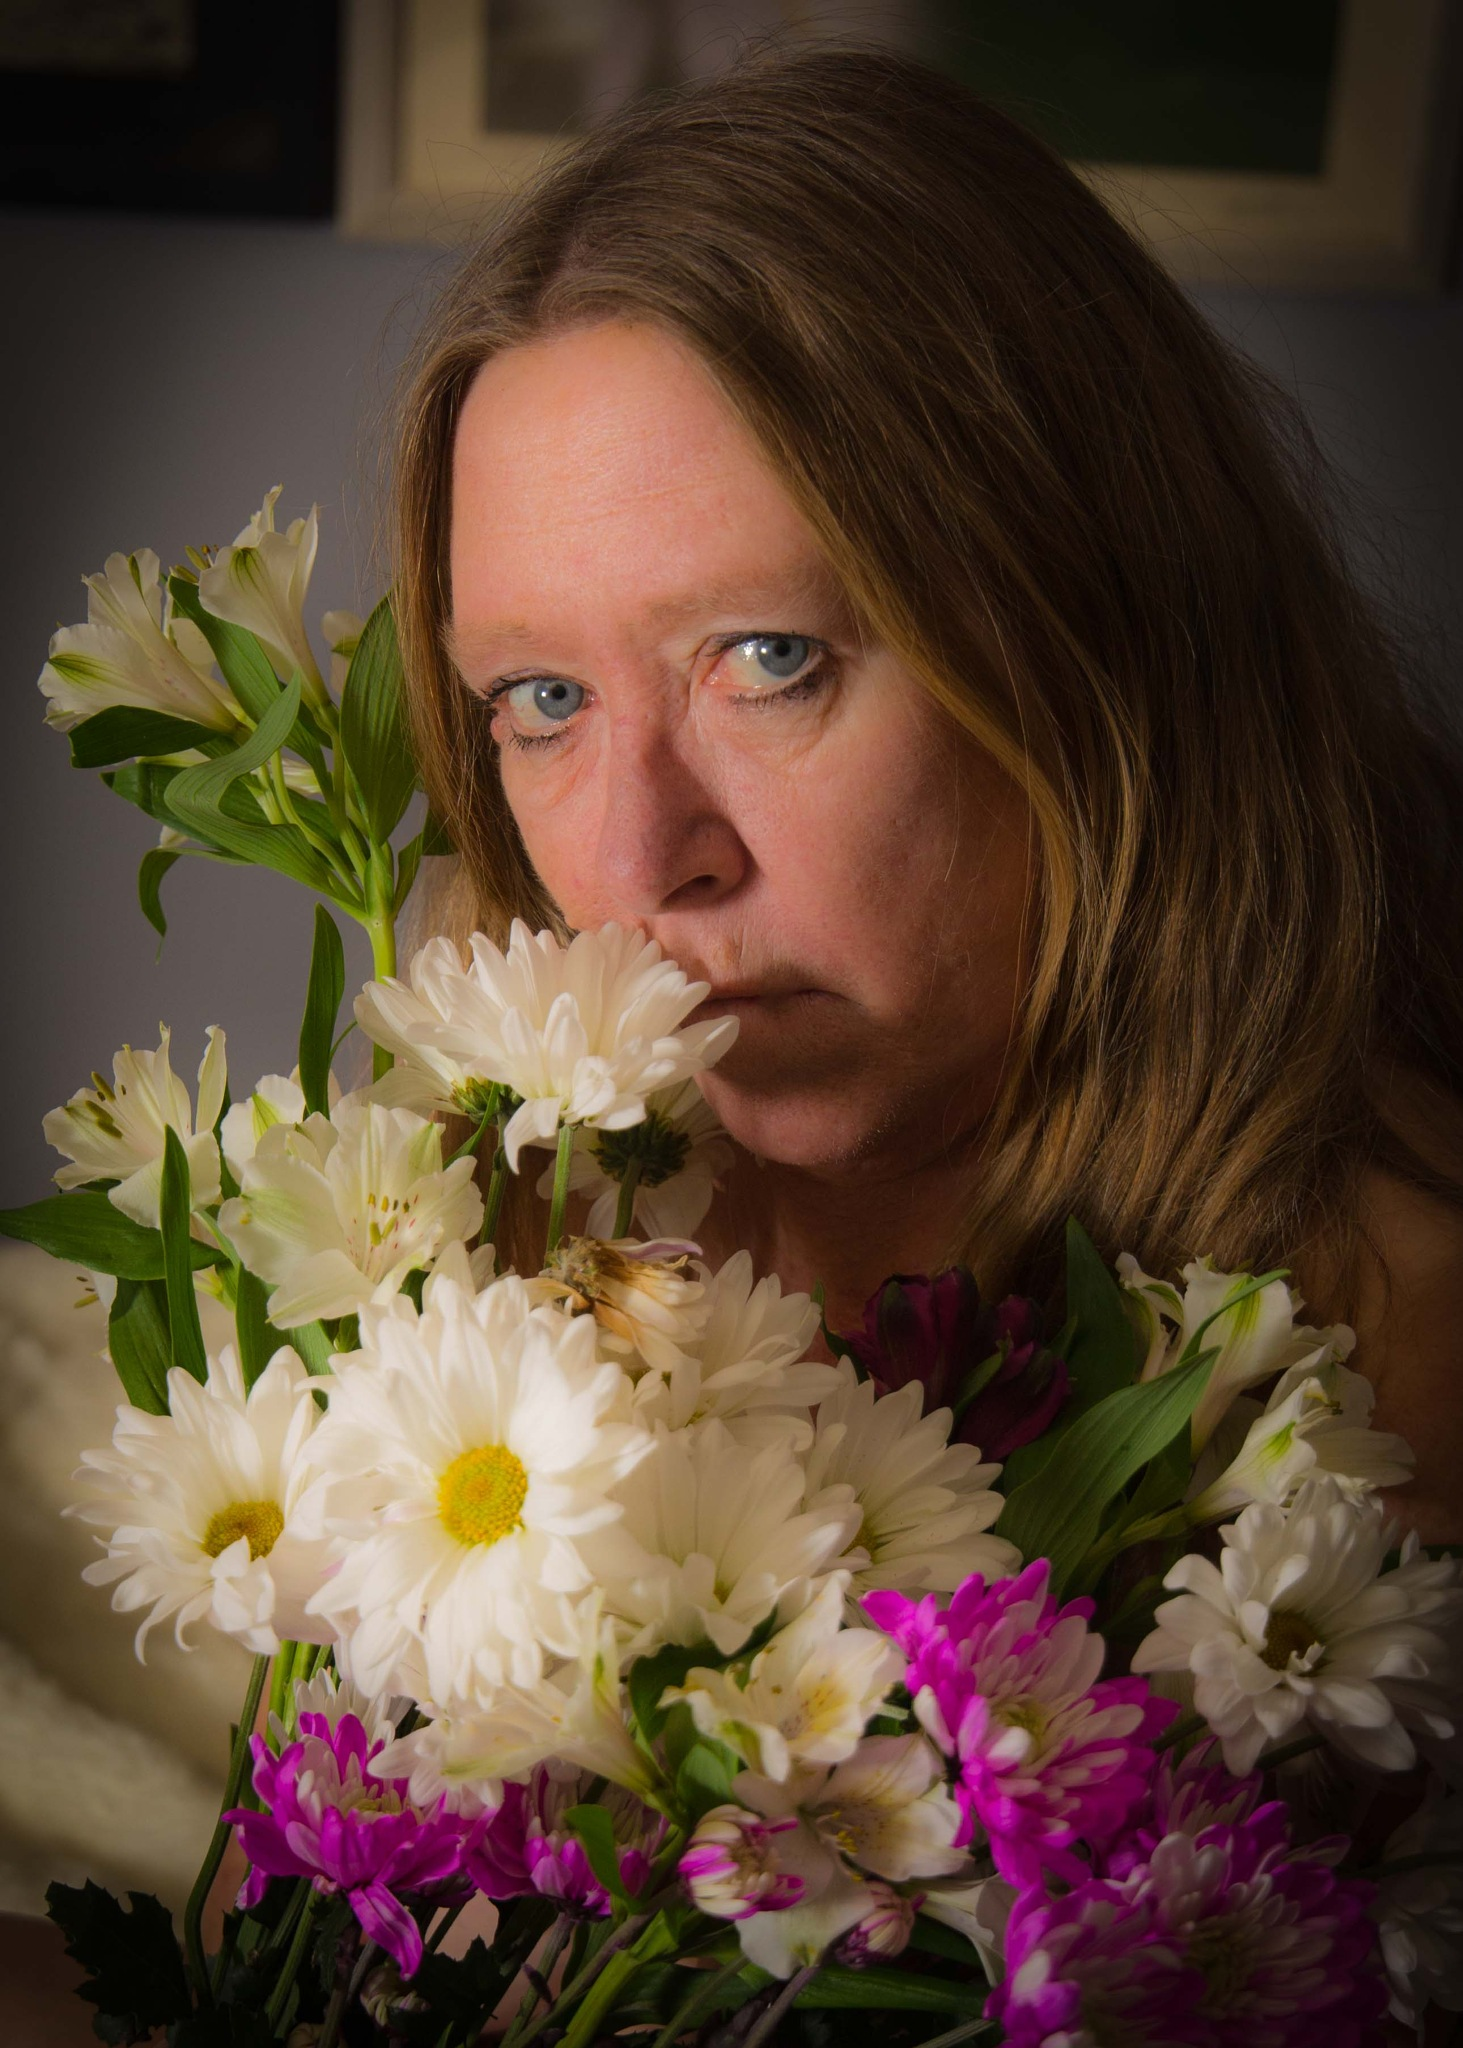 My Flowers by renman1